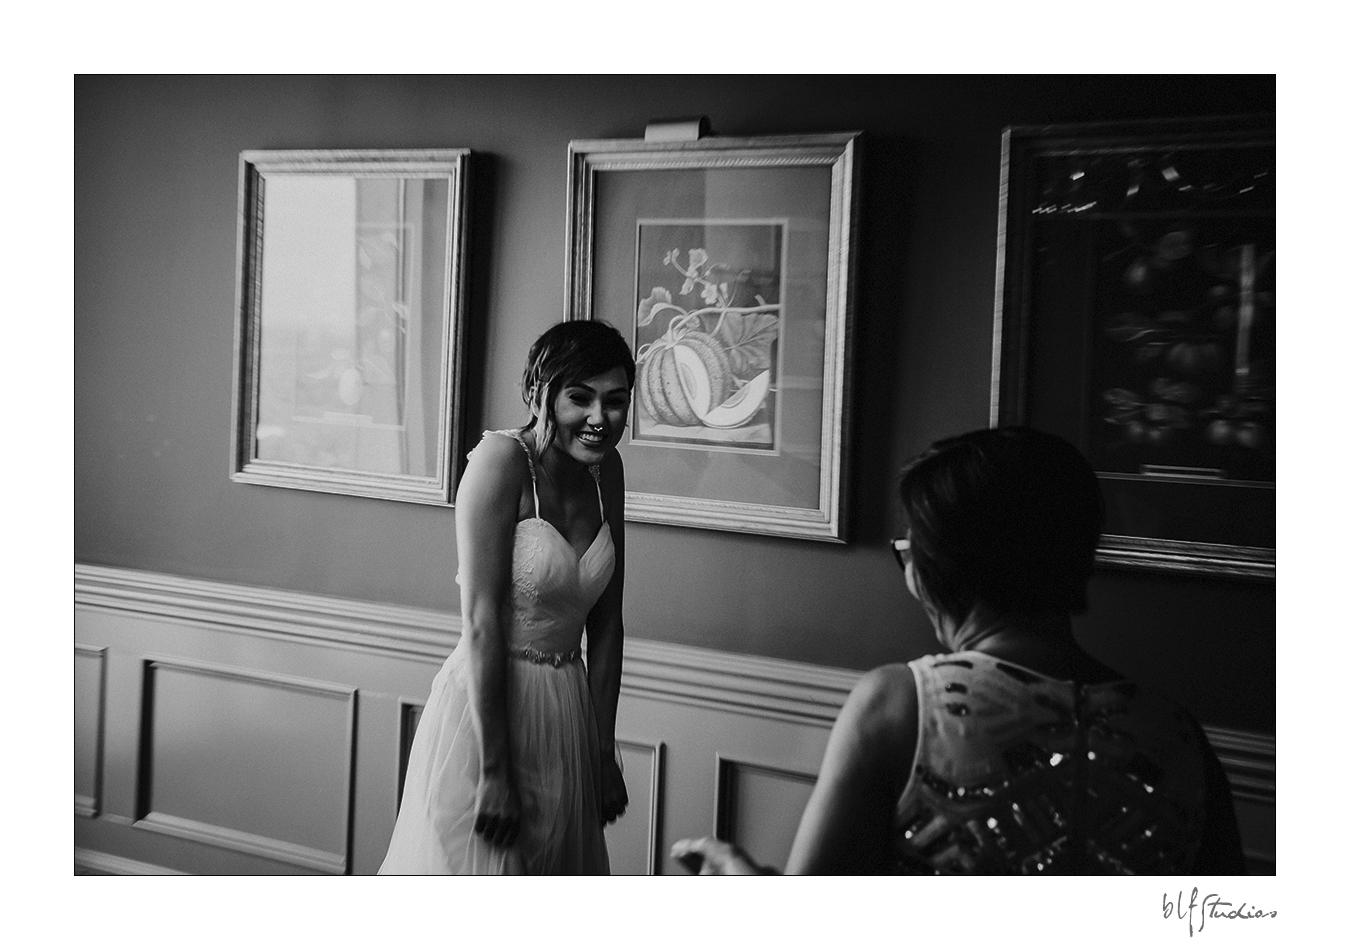 0010-blfstudios-wedding-photographer-daniel-danielle-atlanta.jpg